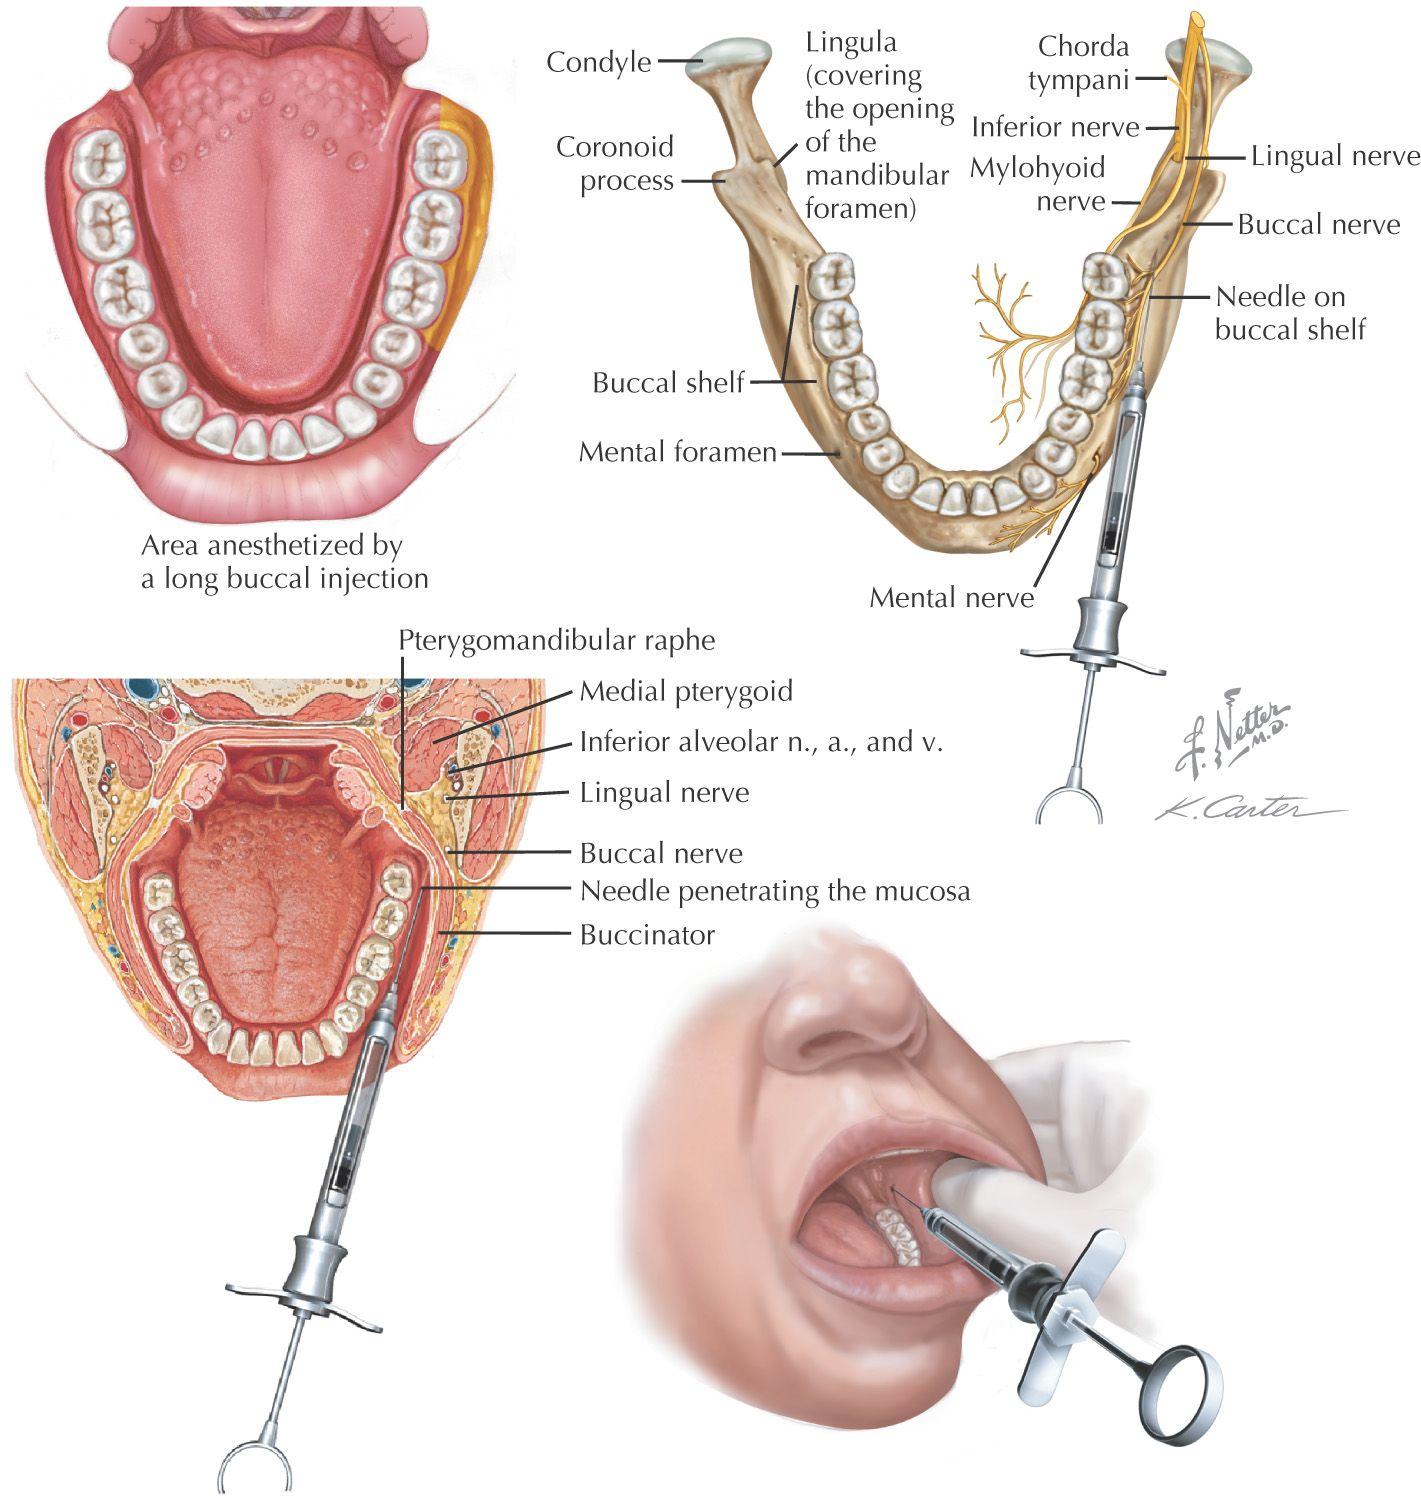 anestesia dental #dentista www.clinicadentalmagallanes.com ...